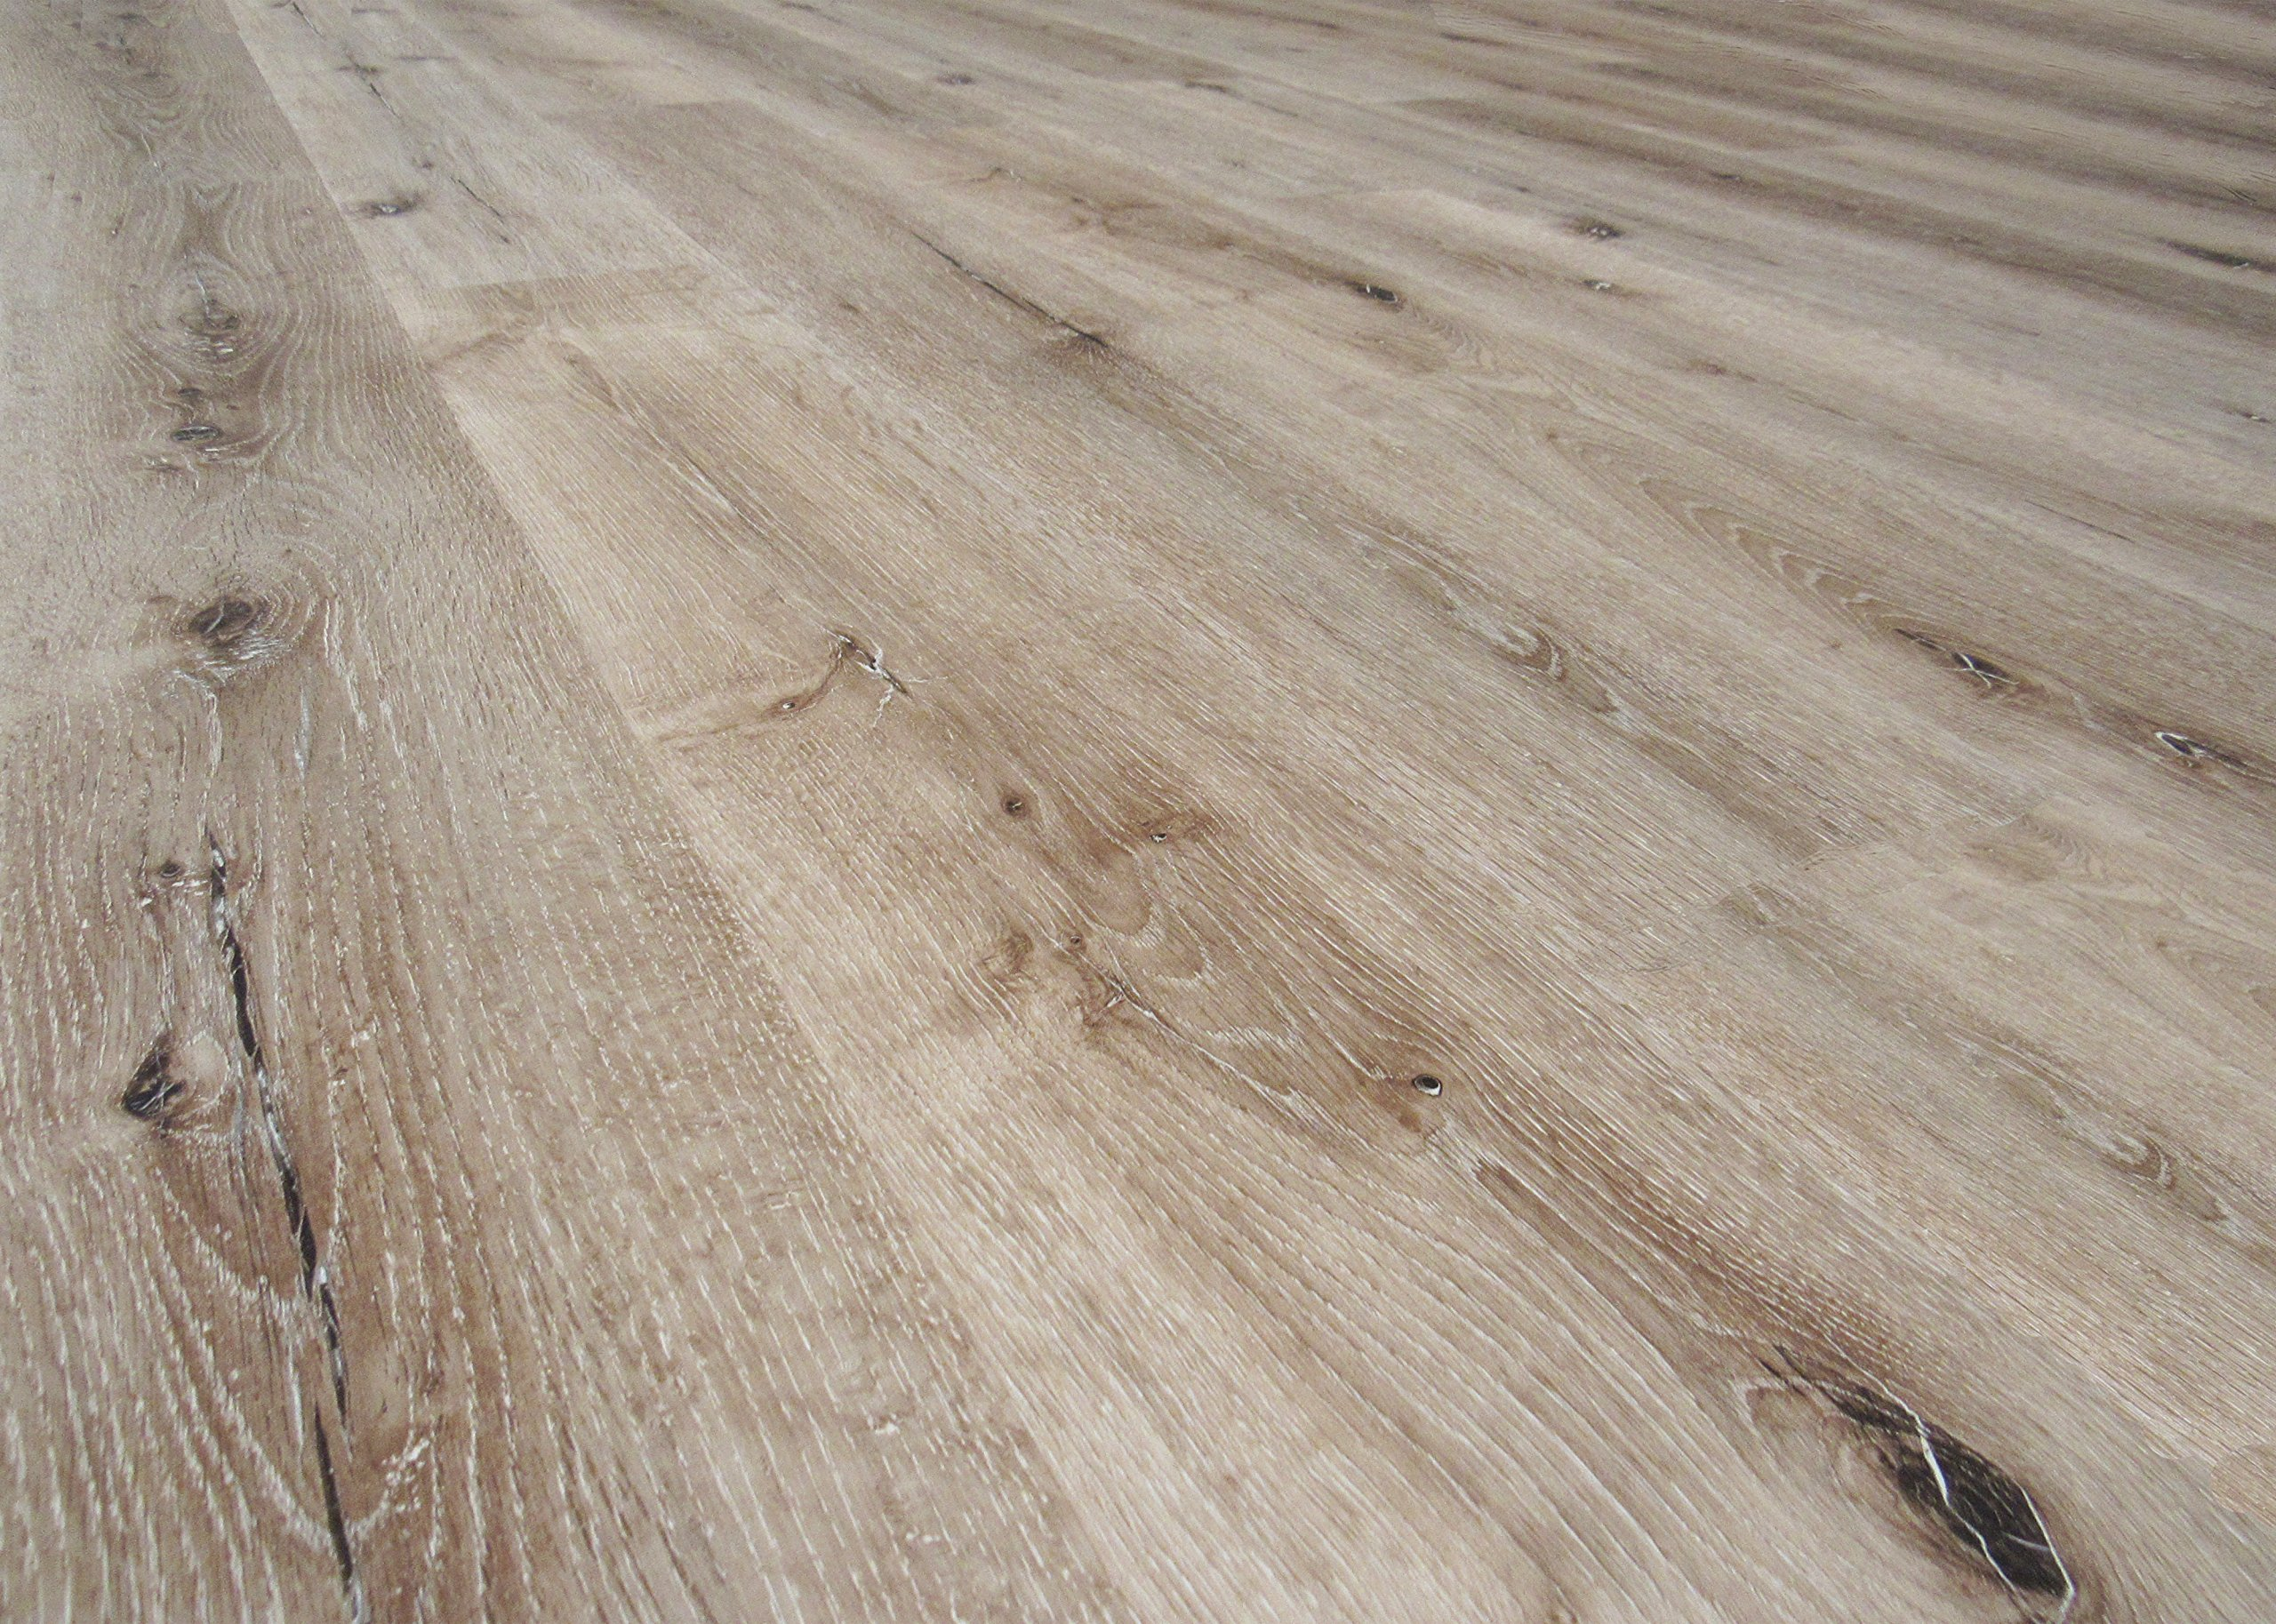 DriCore Waterproof WPC Engineered Flooring 47.64 in x 6.85 in x 6.6mm (40.79 Square Feet, Arctic Oak)